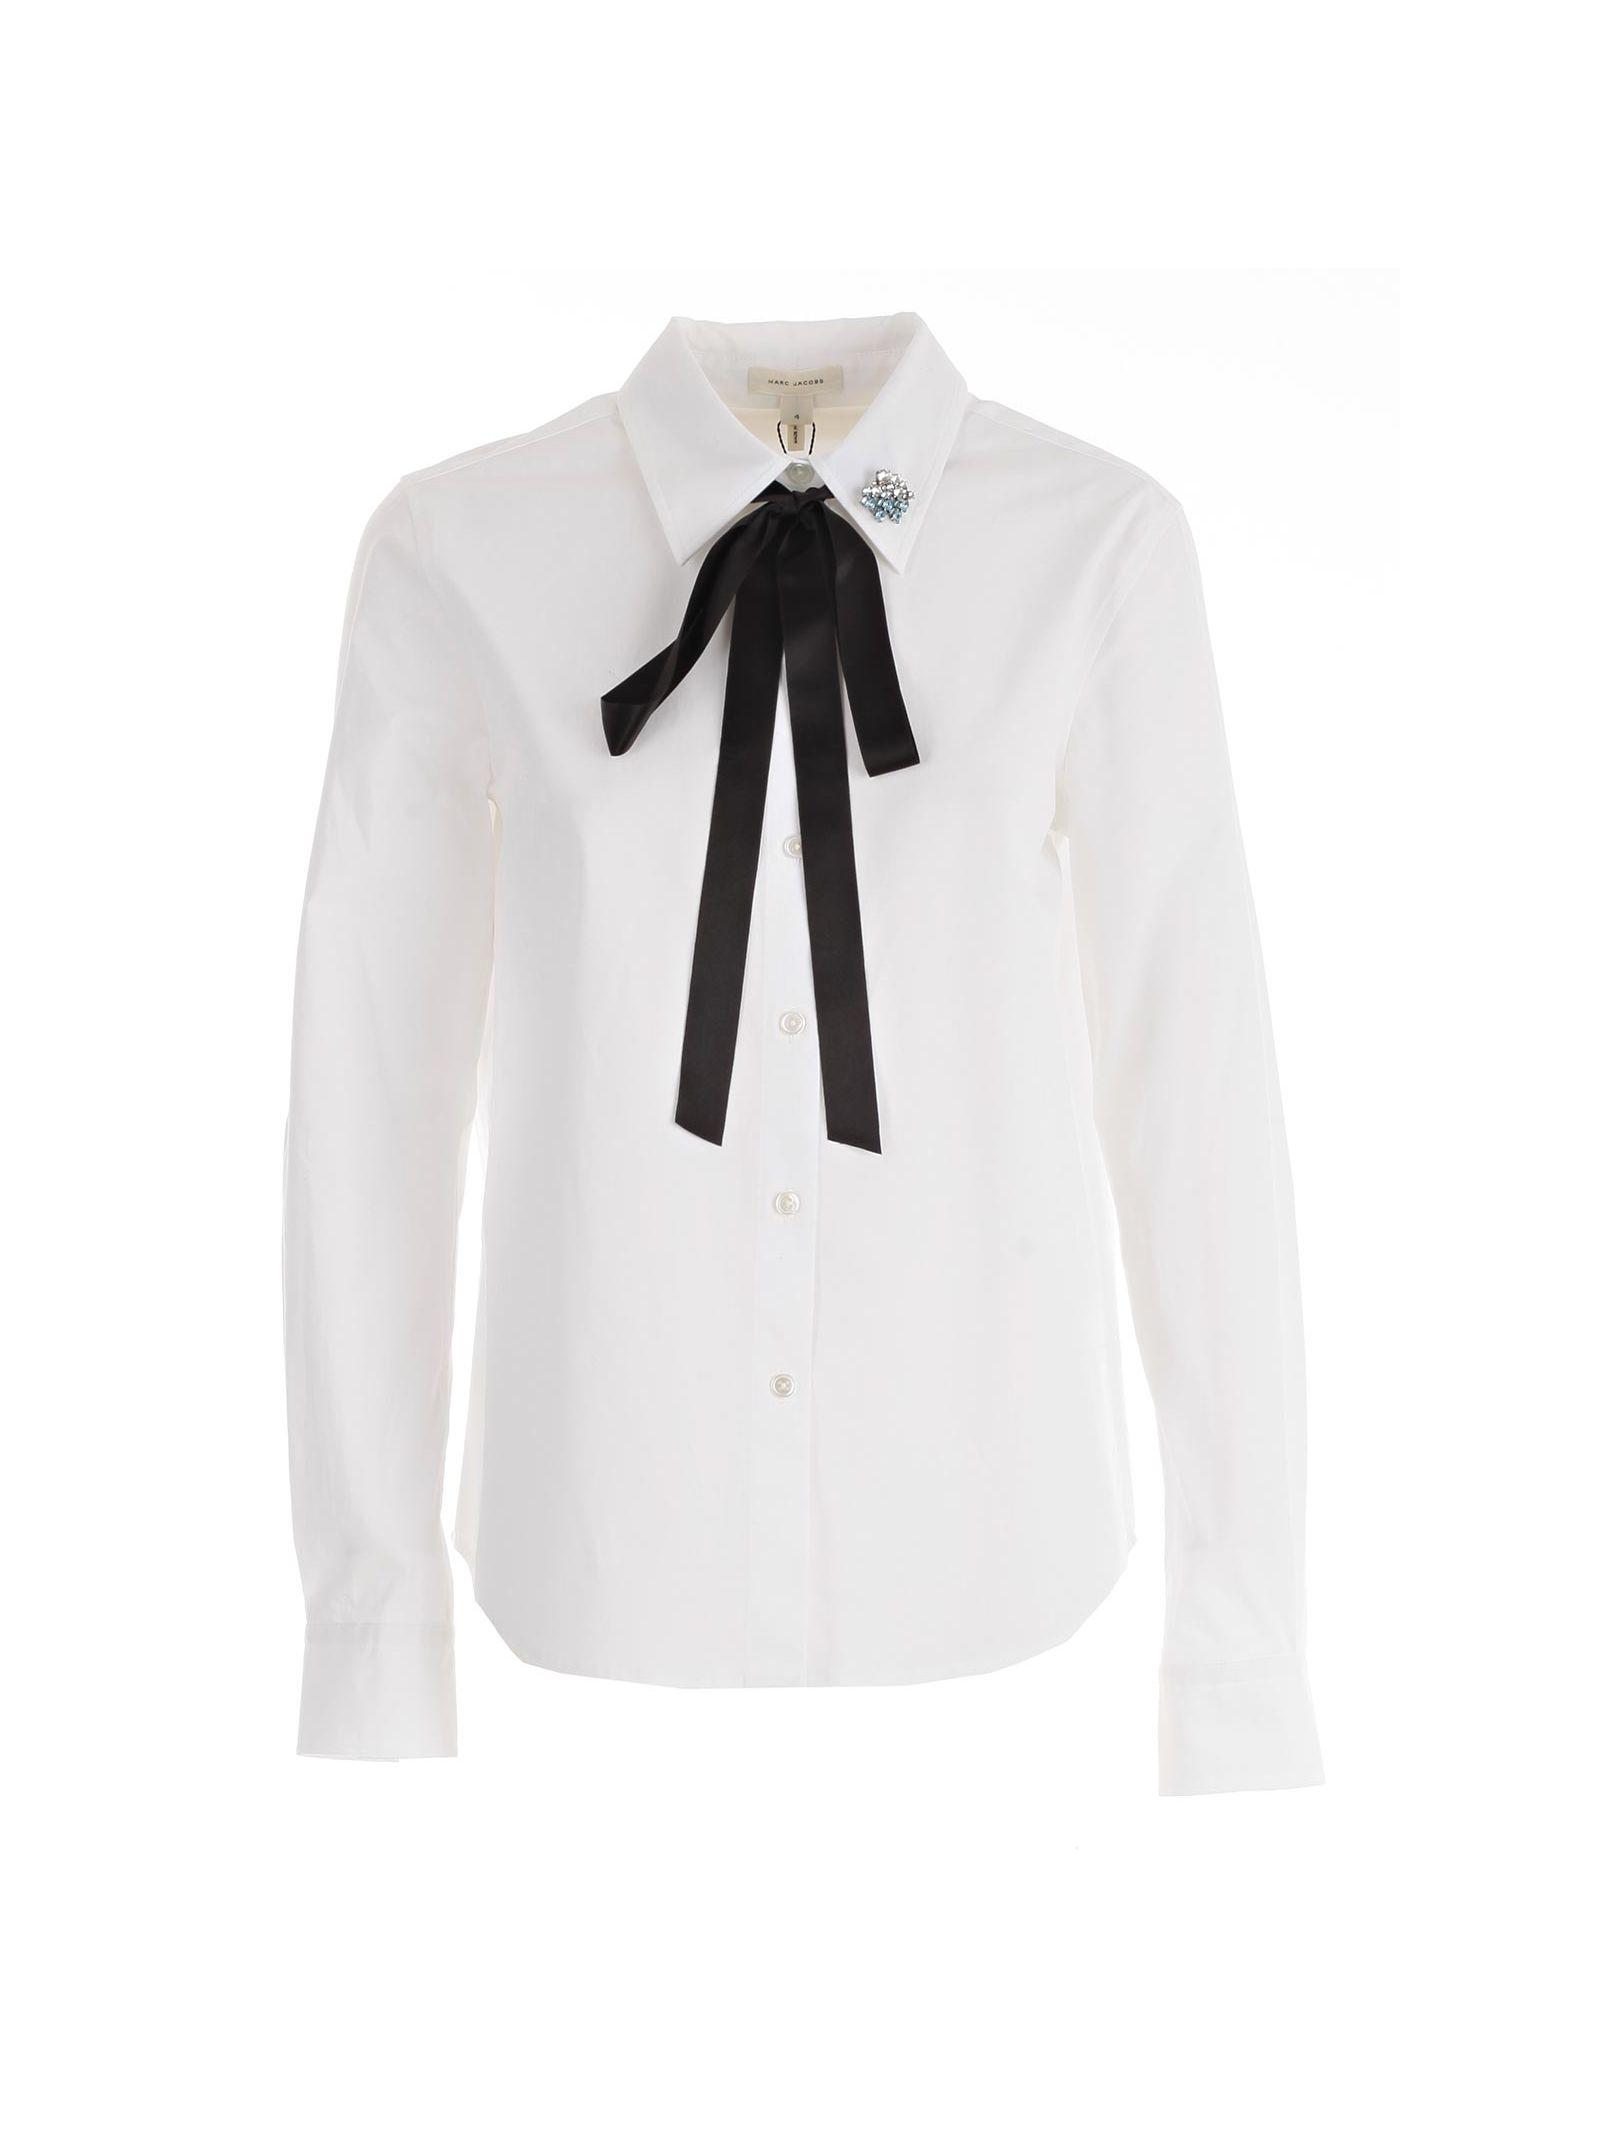 marc jacobs female marc jacobs shirt